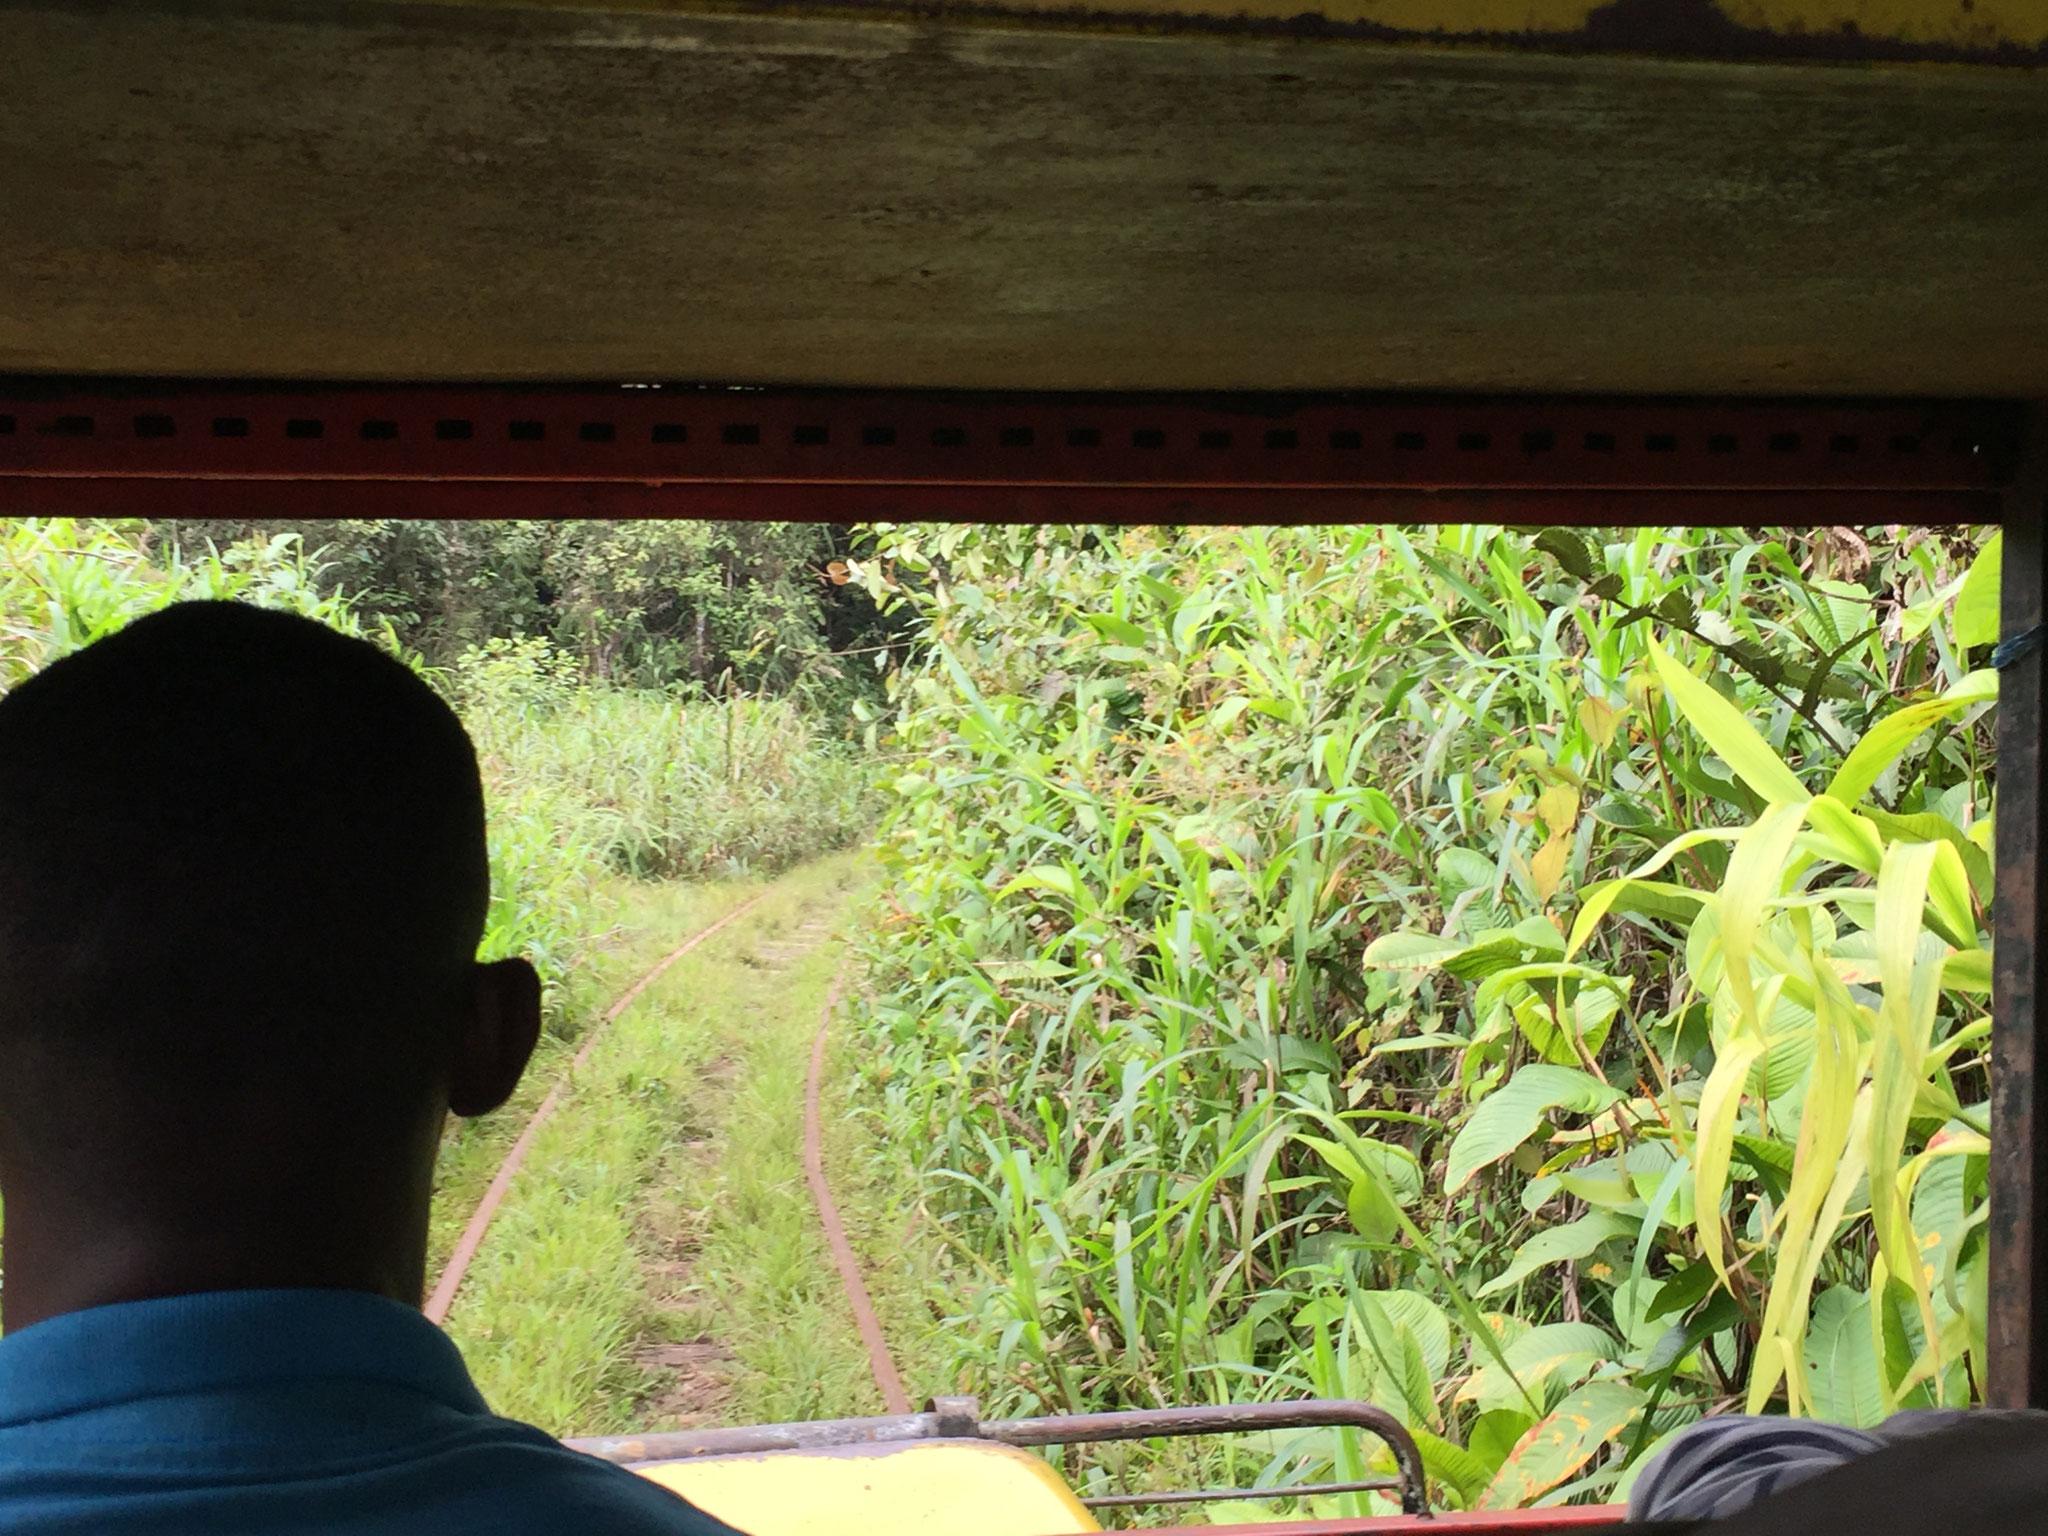 Fahrt durch den Dschungel